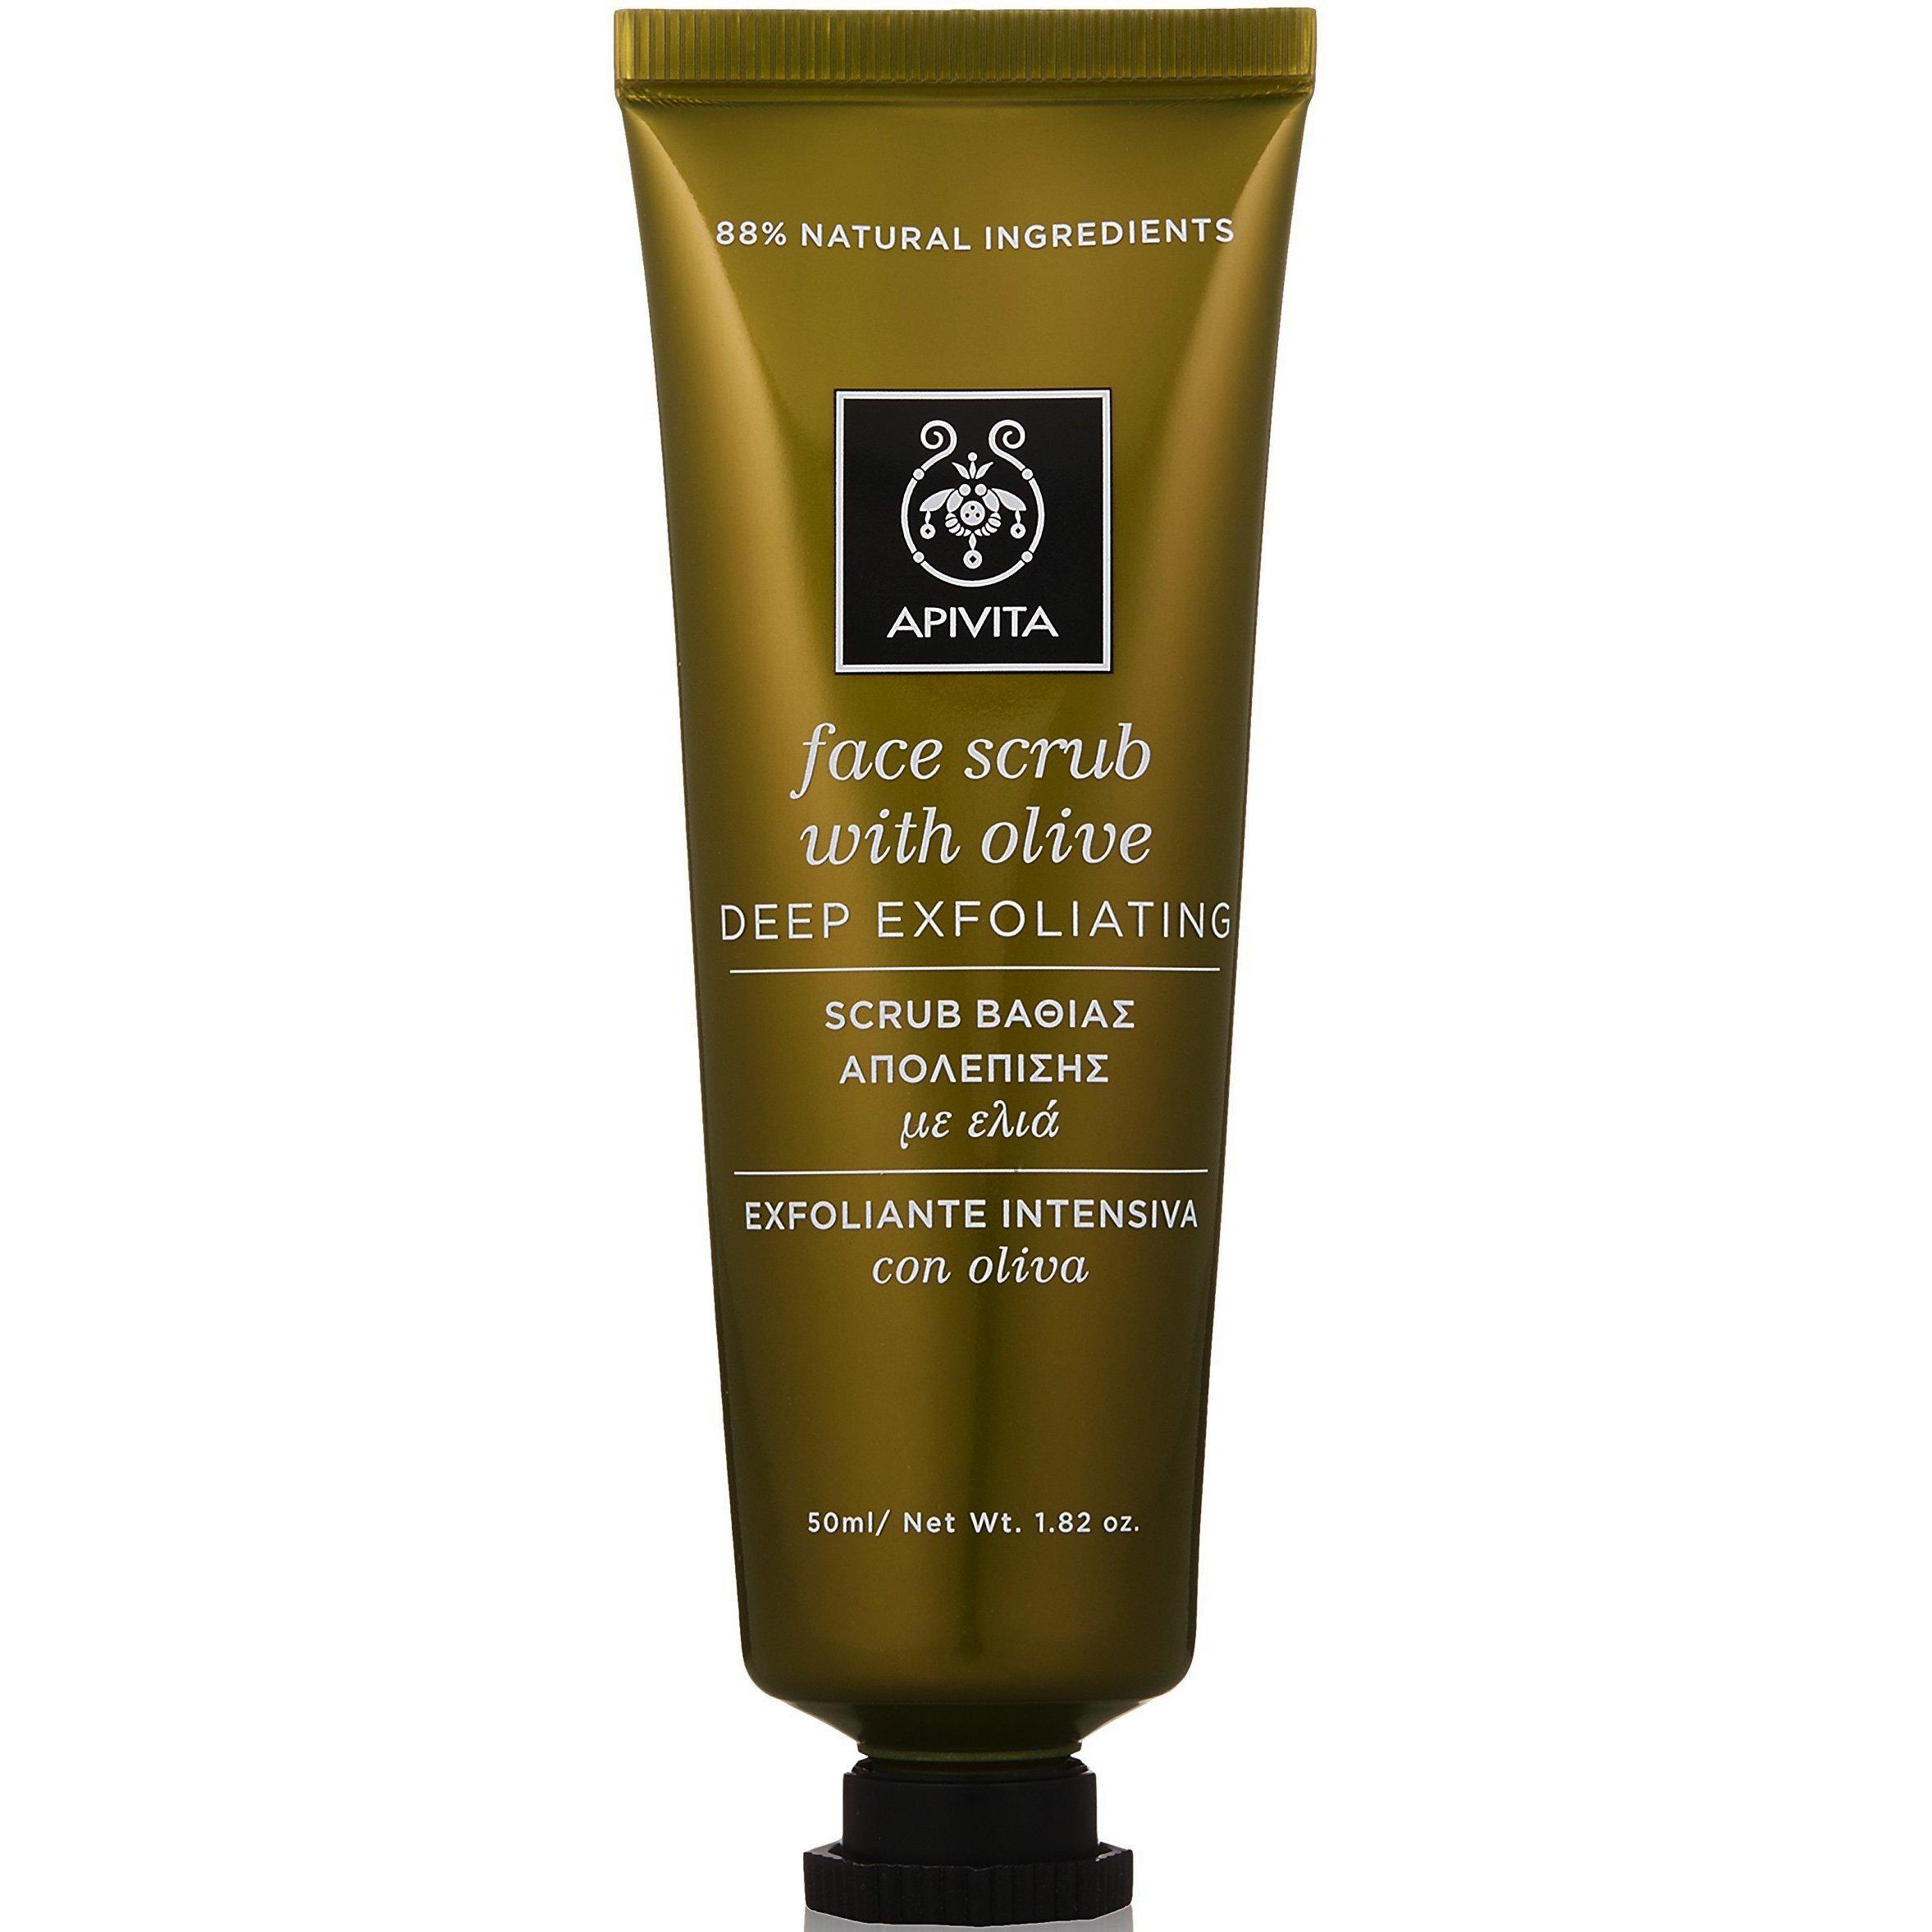 Apivita Face Scrub With Olive Scrub Βαθιάς Απολέπισης με Ελιά, Ιδανικό για Λιπαρές/Μικτές Επιδερμίδες, Άνδρες & Έφηβους 50ml